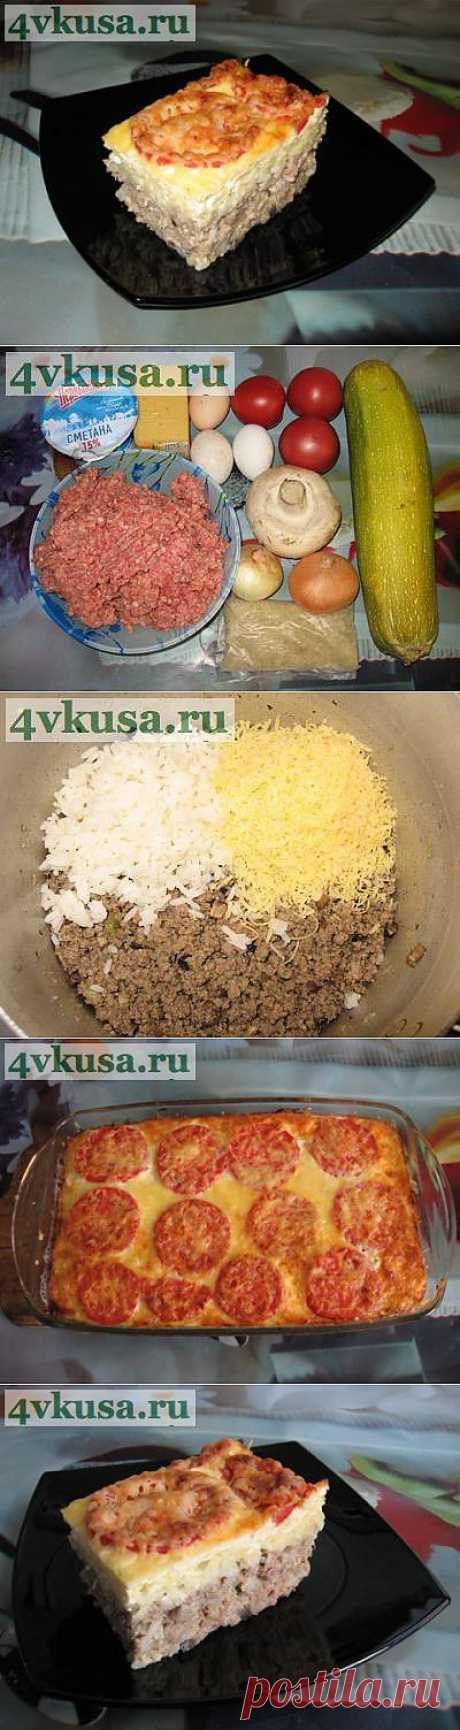 Запеканка из кабачков с фаршем. Фоторецепт.   4vkusa.ru